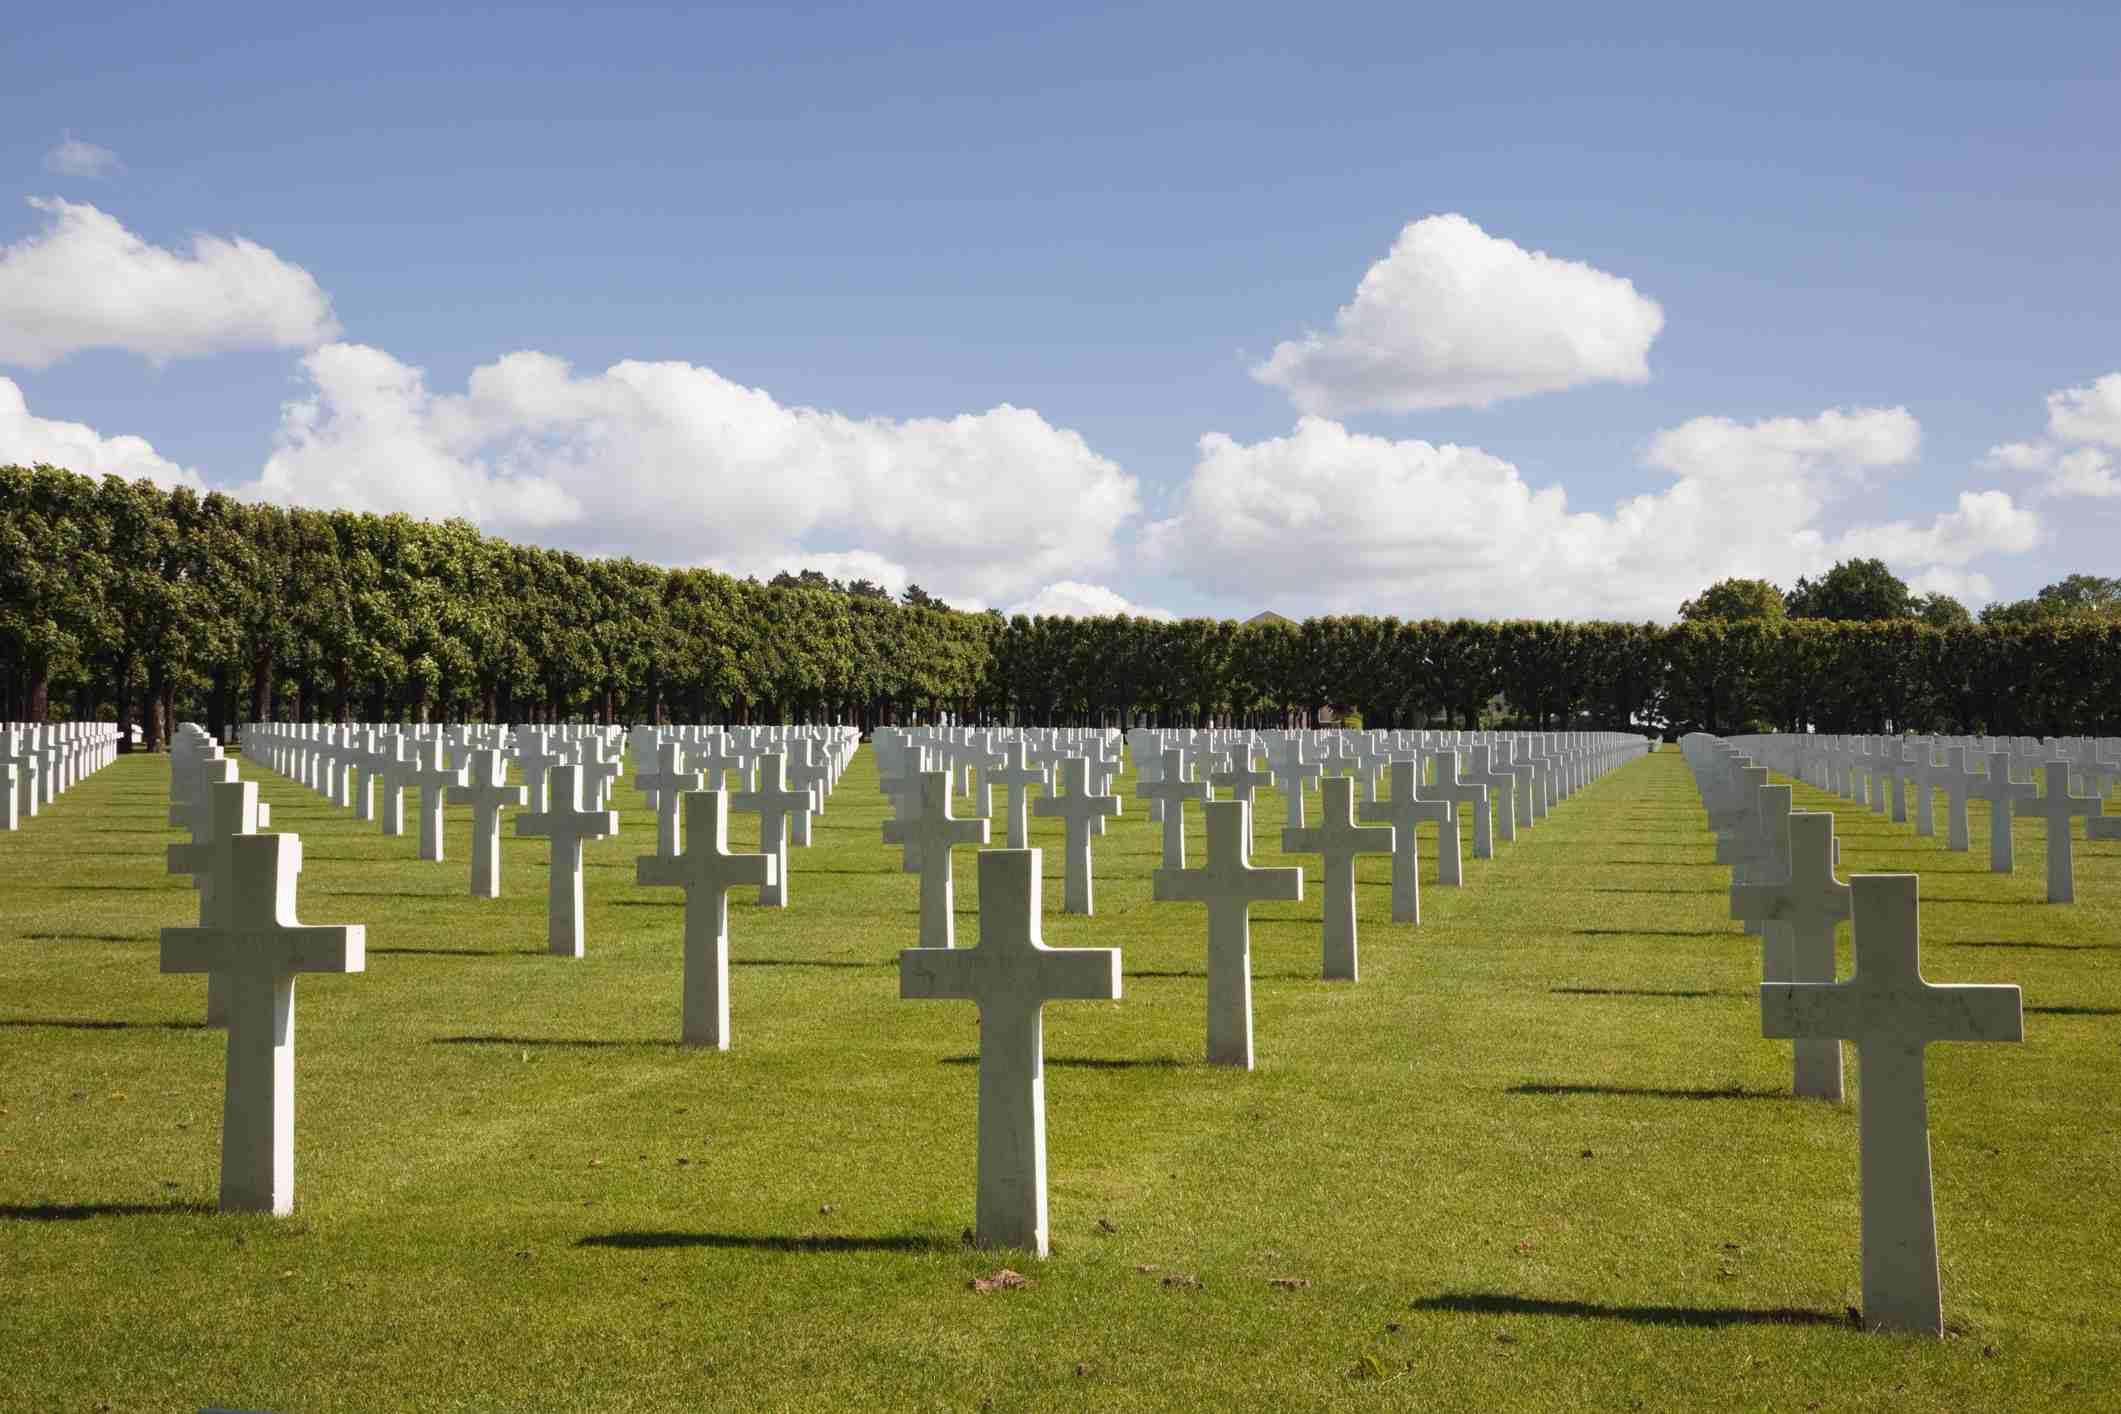 Filas de lápidas de mármol blanco en el cementerio militar estadounidense Meuse-Argonne para la batalla de Verdun, Romagne-Gesnes, Meuse, Francia, Europa de la Primera Guerra Mundial